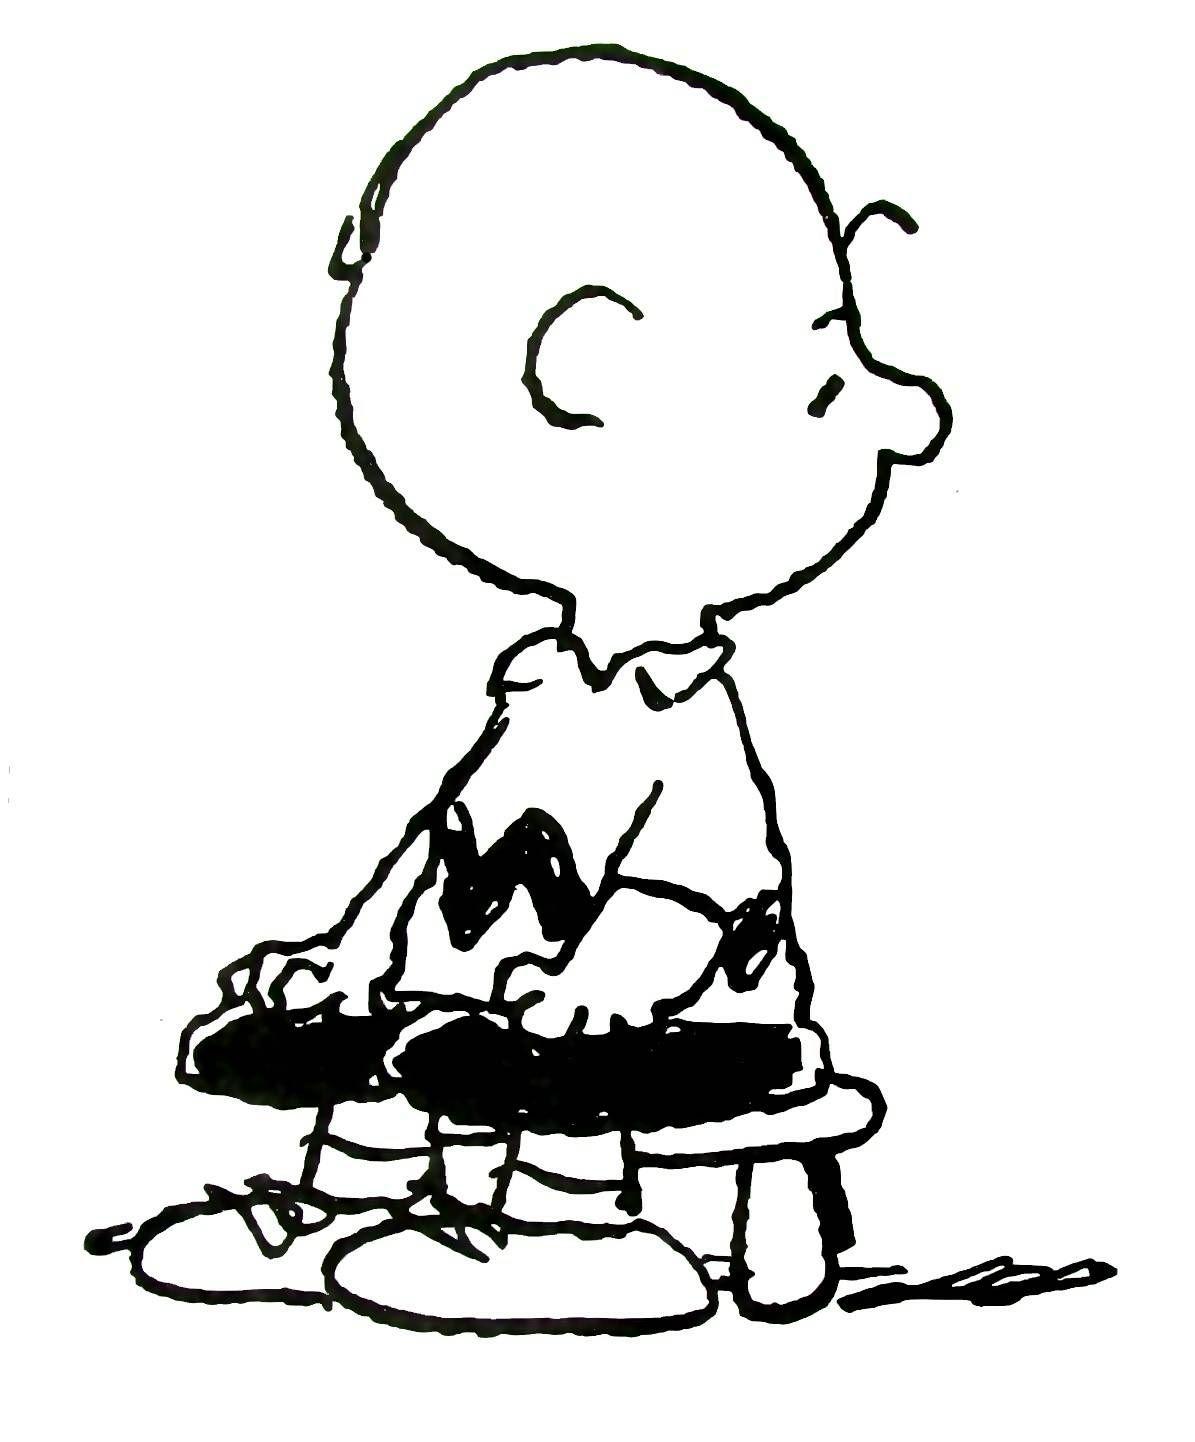 Charlie Brown Coloring Book Page Printable Coloring